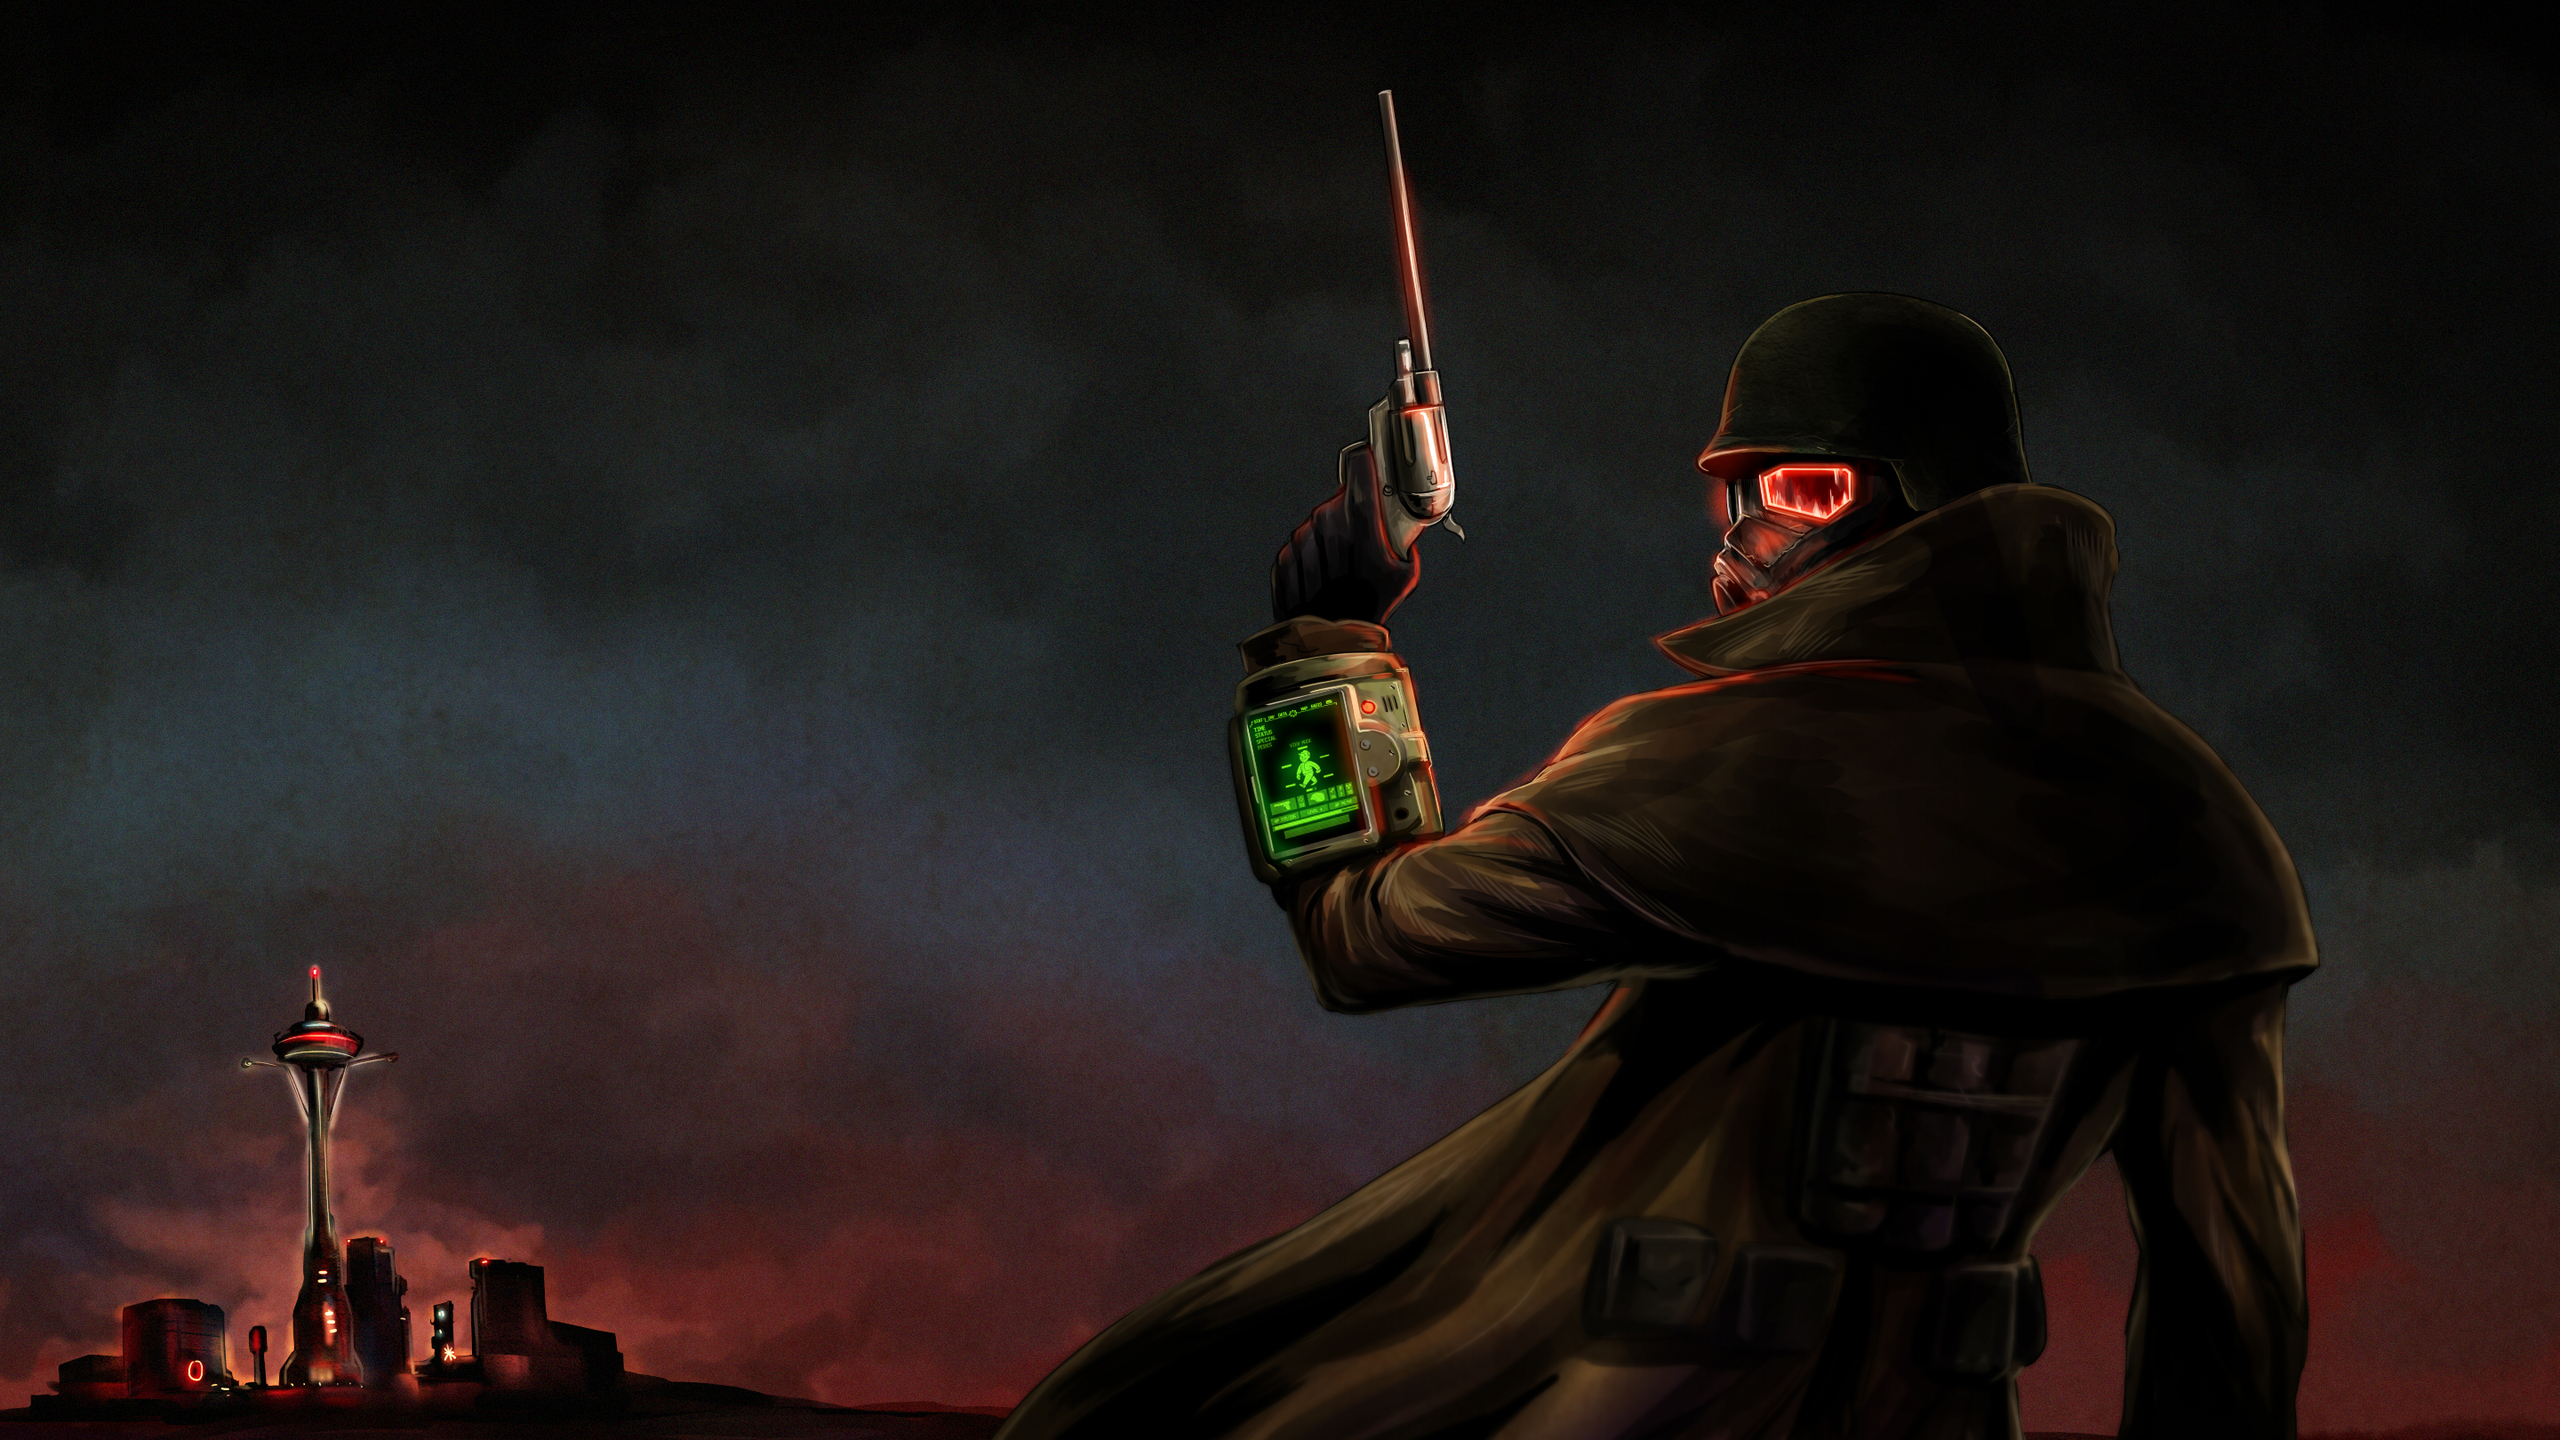 Fallout New Vegas Ranger Wallpaper Posted By Sarah Mercado